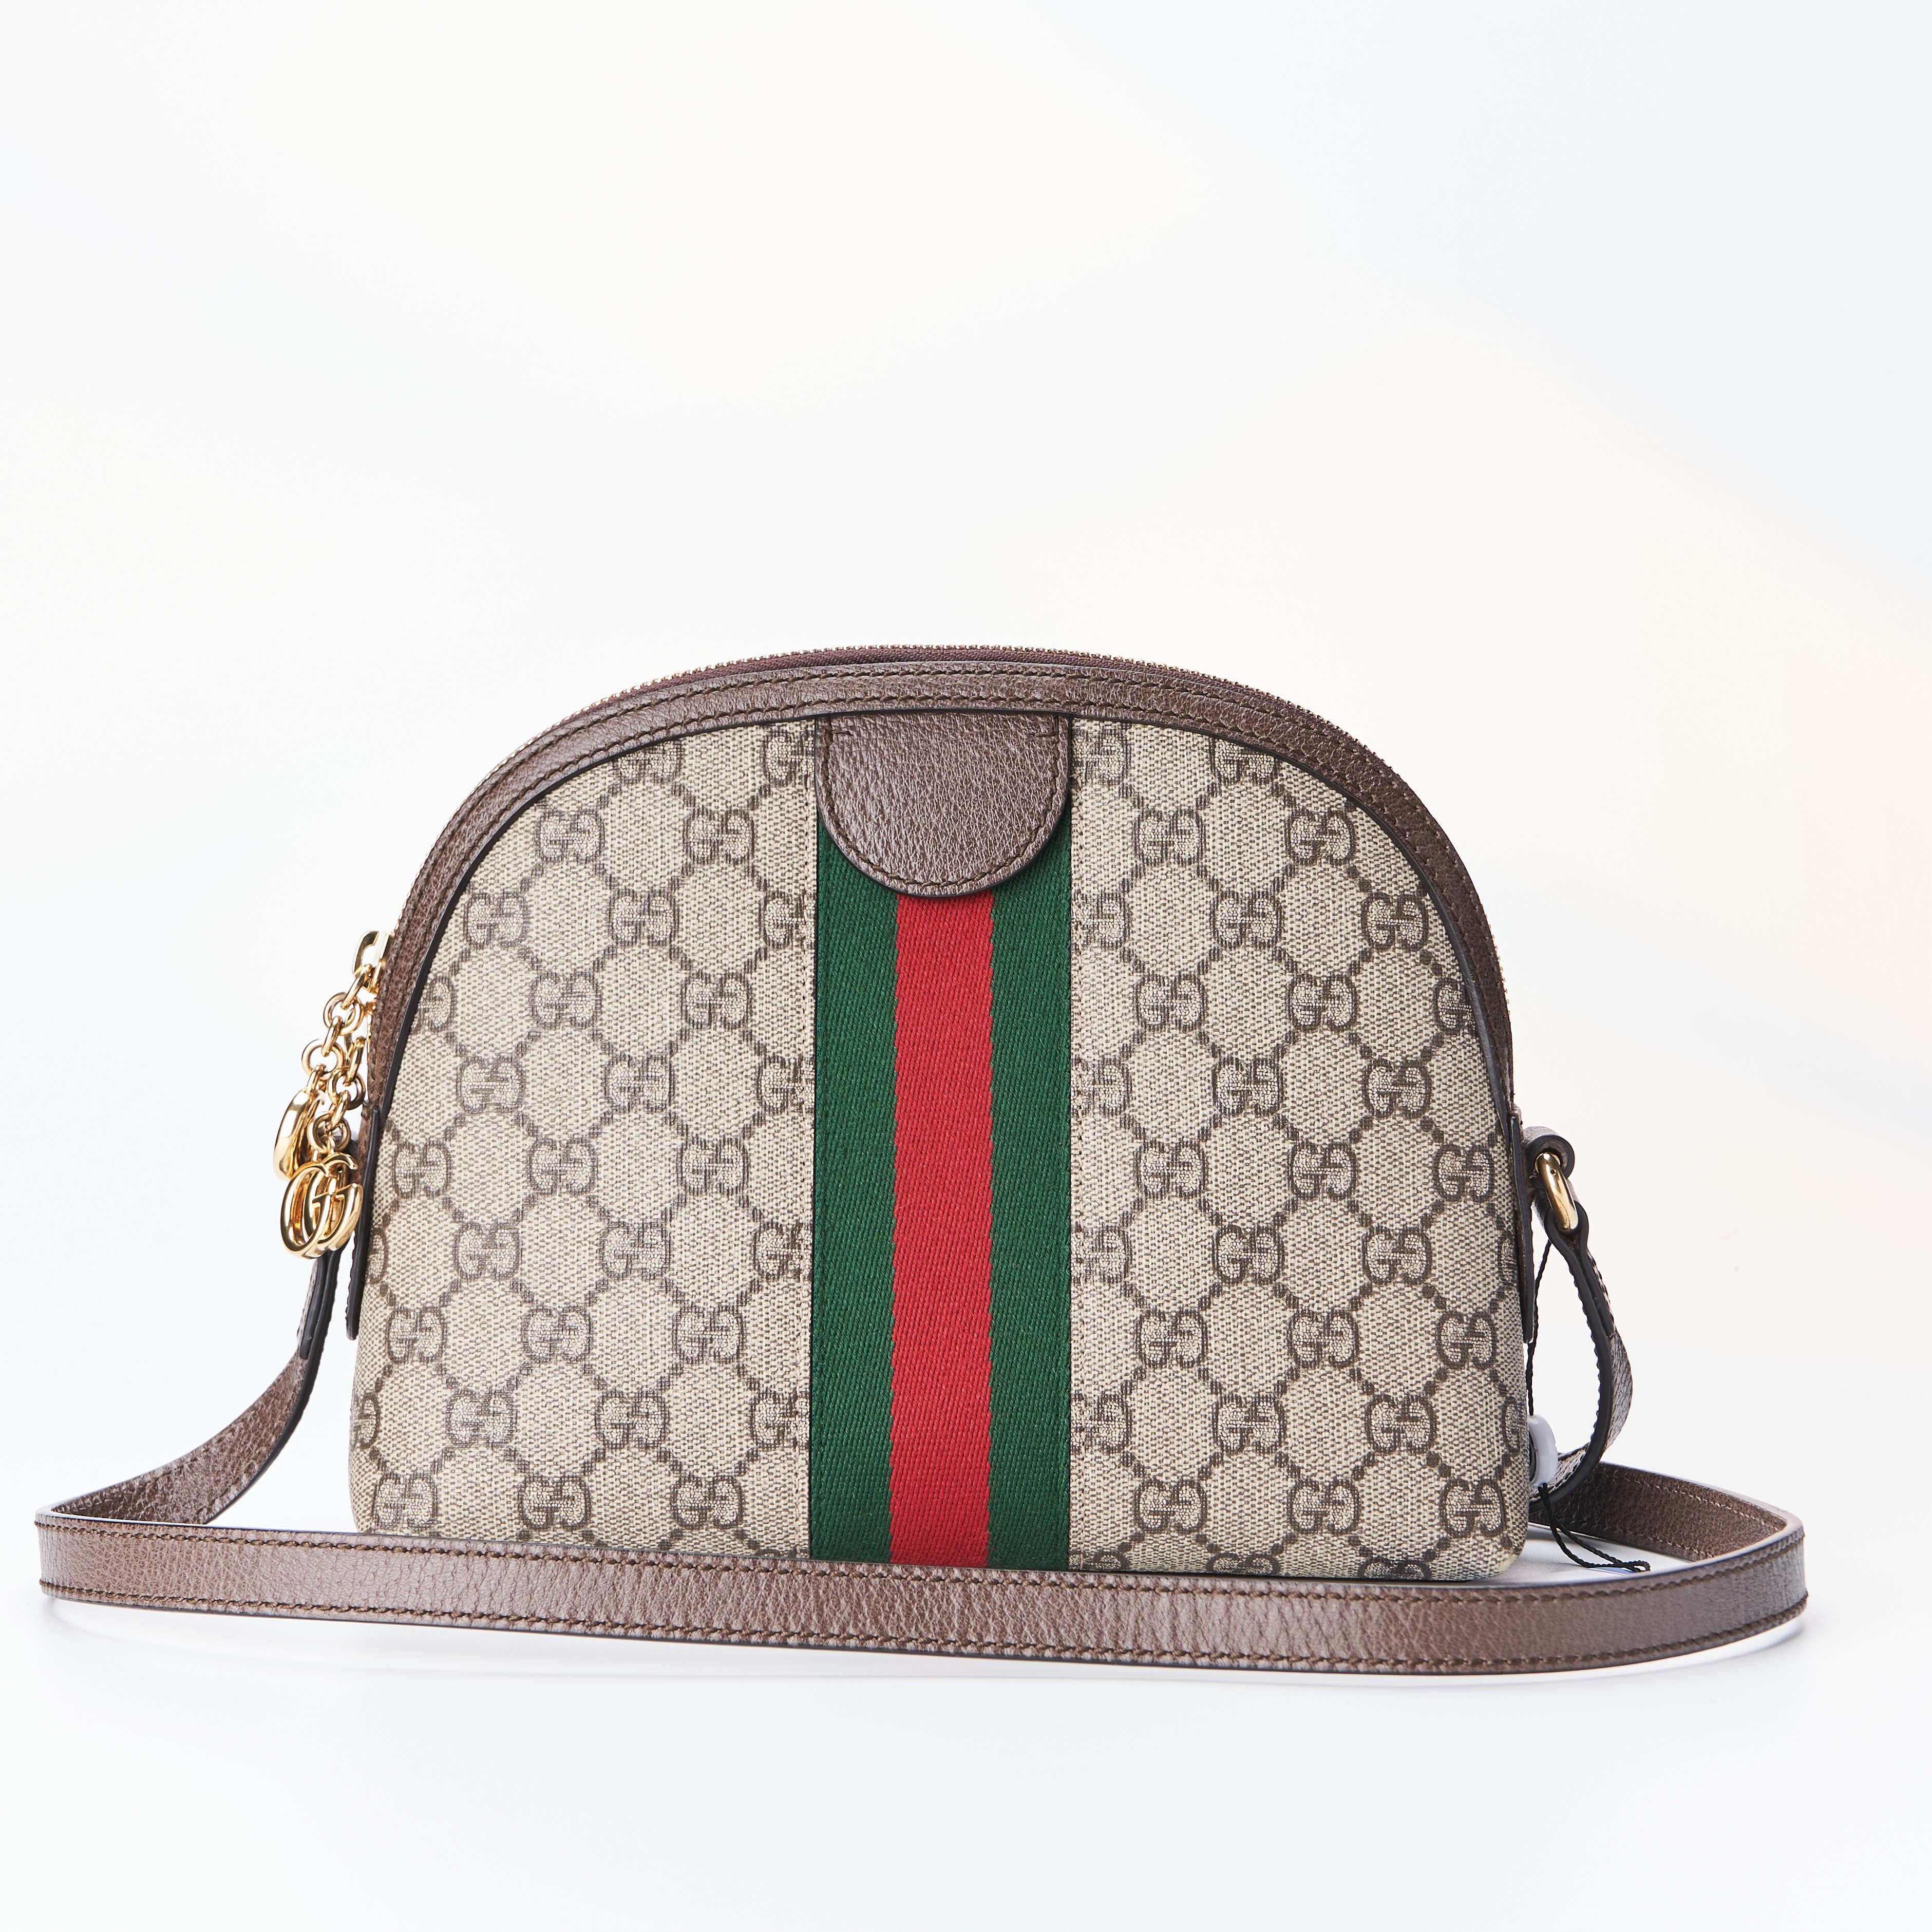 gucci贝壳包 【95新】Gucci ophidia贝壳包  22×8×18 公价¥9800_推荐淘宝好看的gucci贝壳包